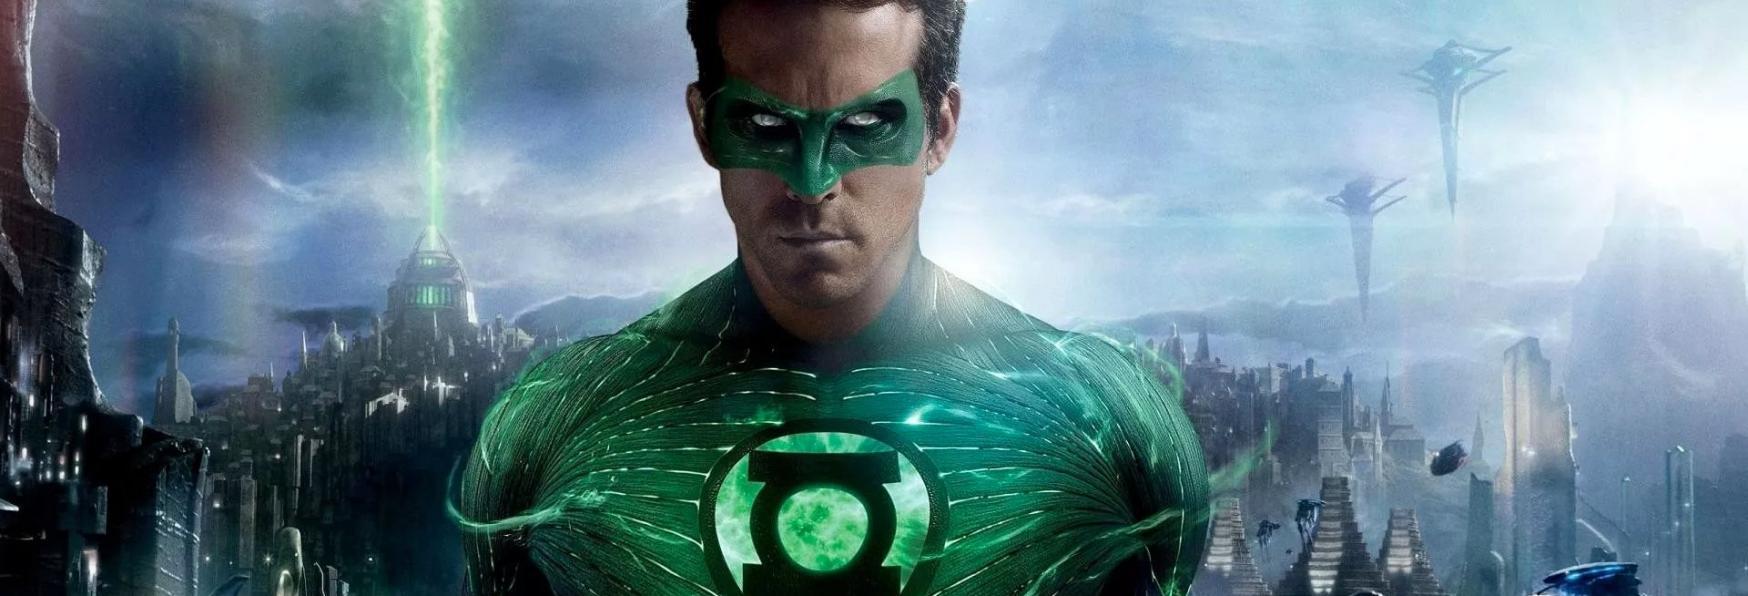 Lanterna Verde e Strange Adventures: Greg Barlanti, HBO e DC al Lavoro sulla nuova Serie TV